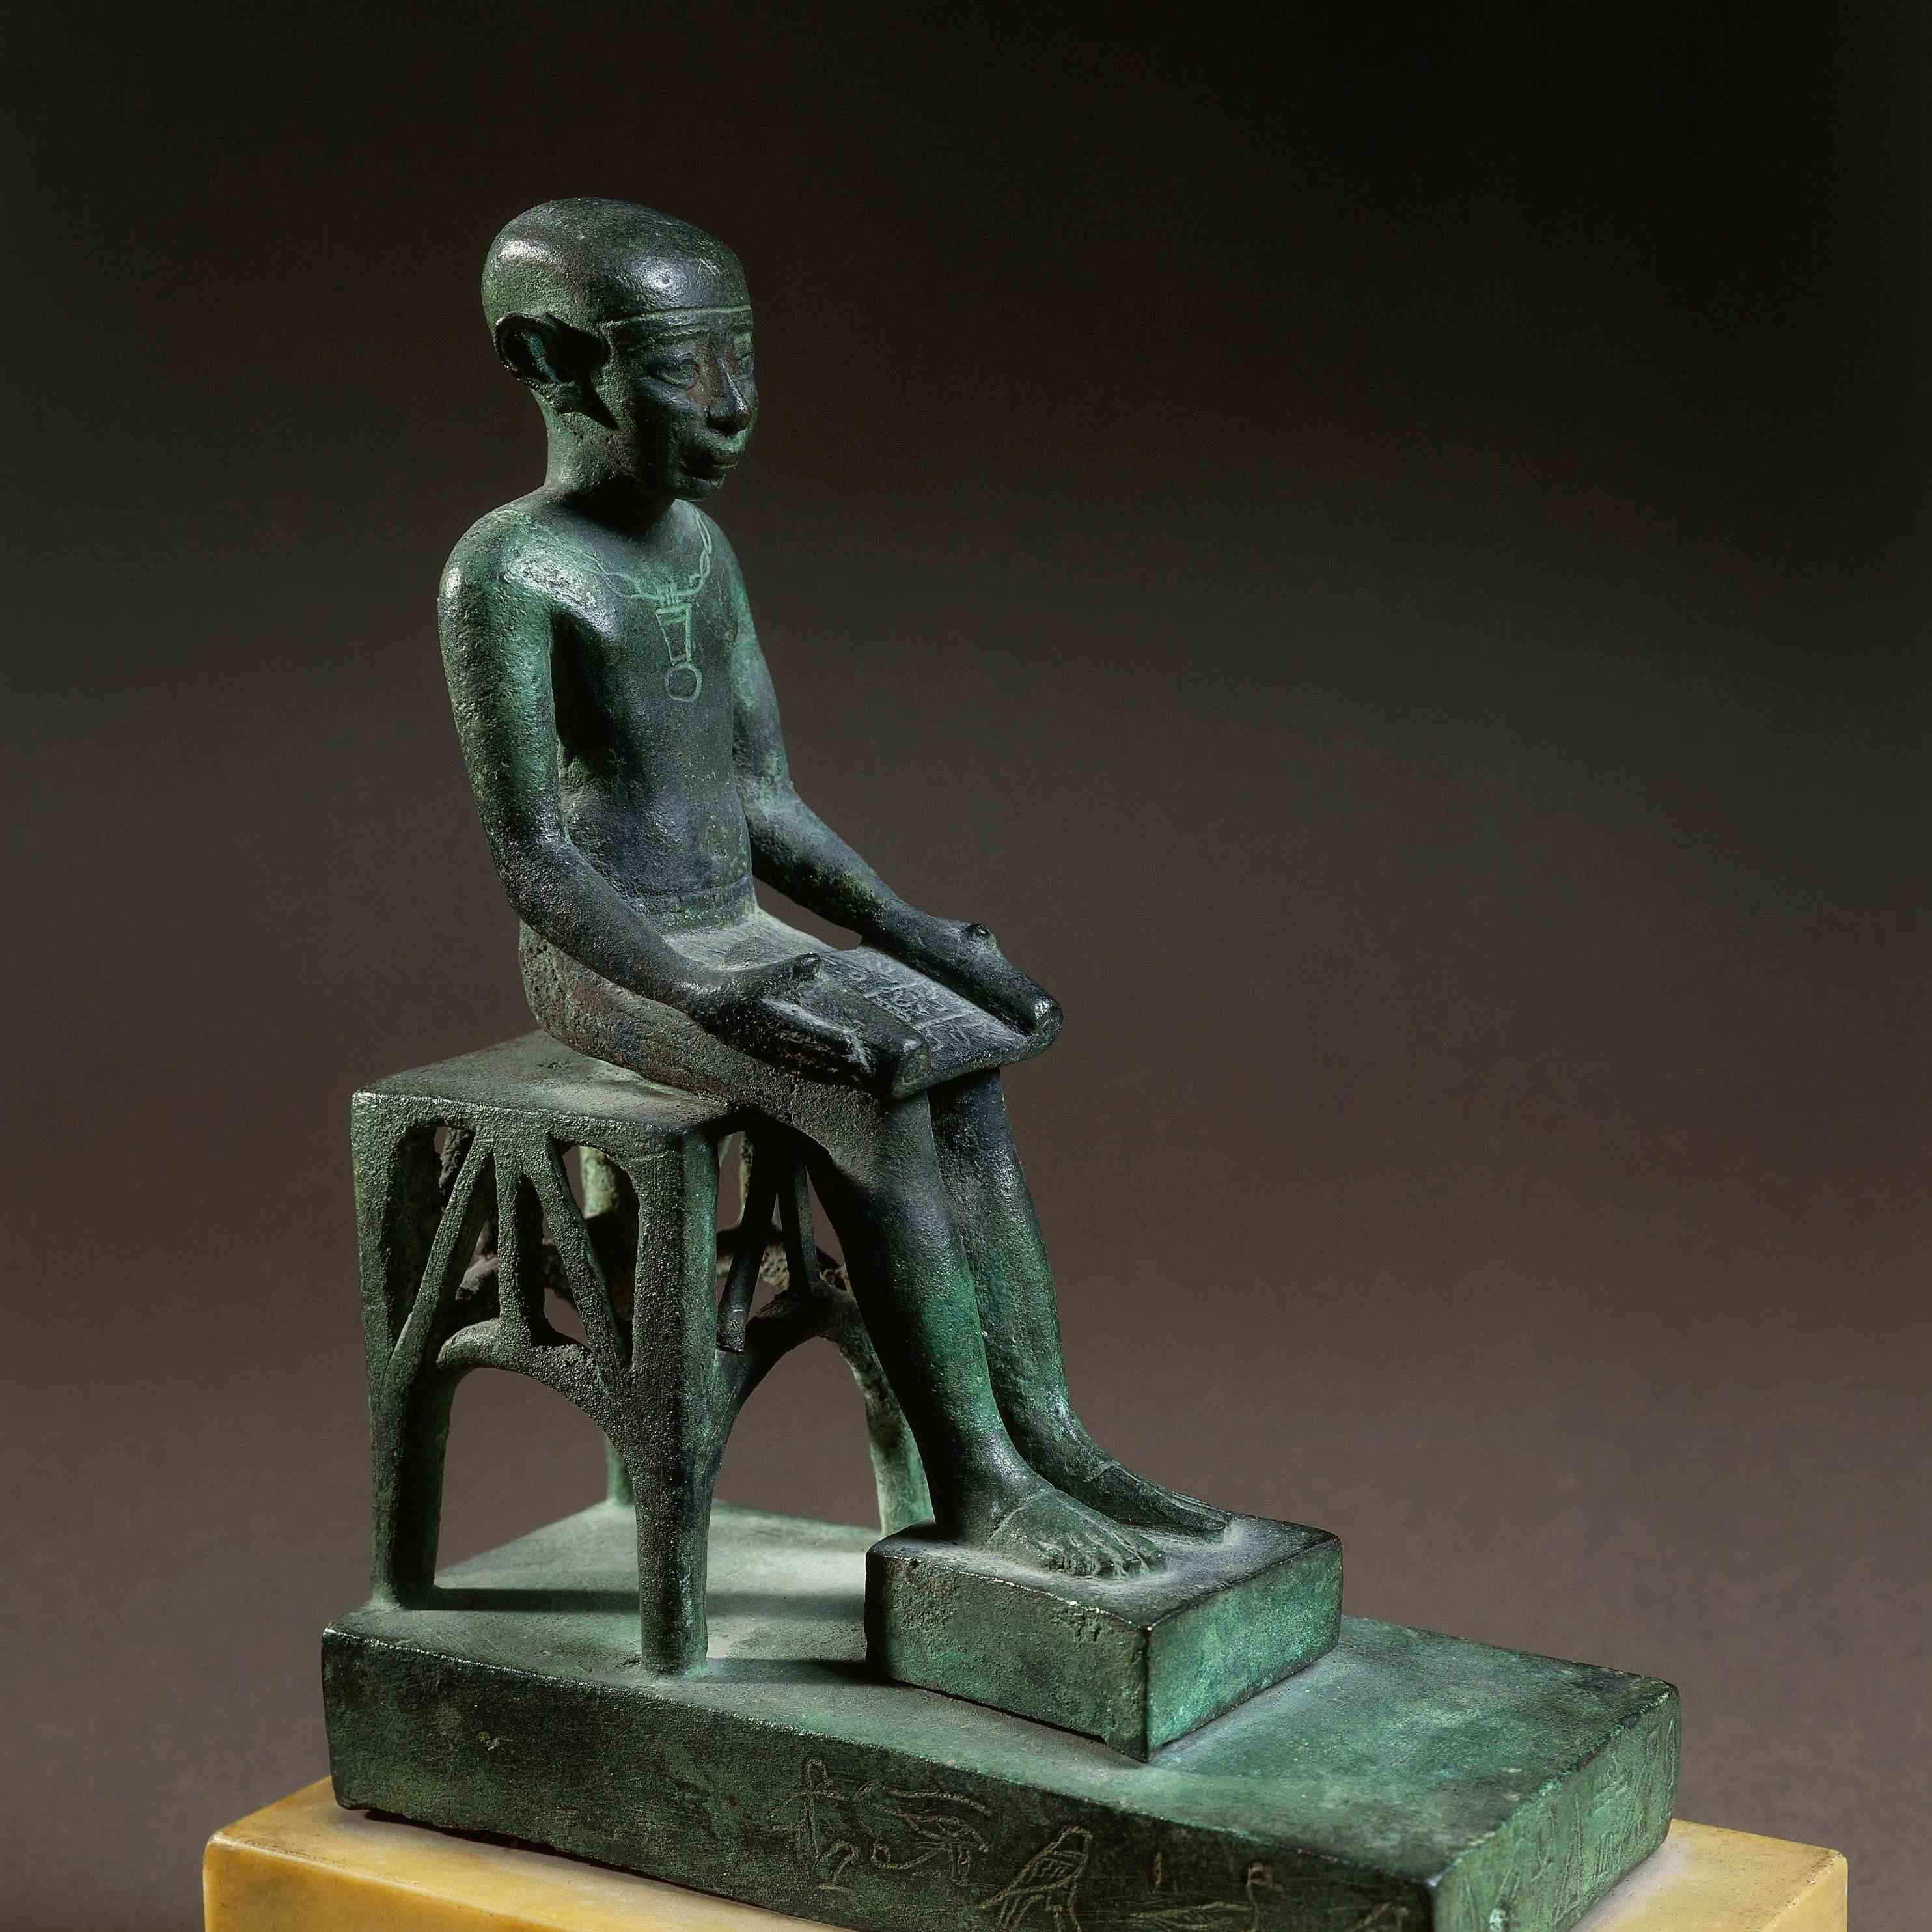 Bronze ex-voto depicting Imhotep, architect of pyramids of Giza. Louvre Museum, Paris, 8th century BCE.